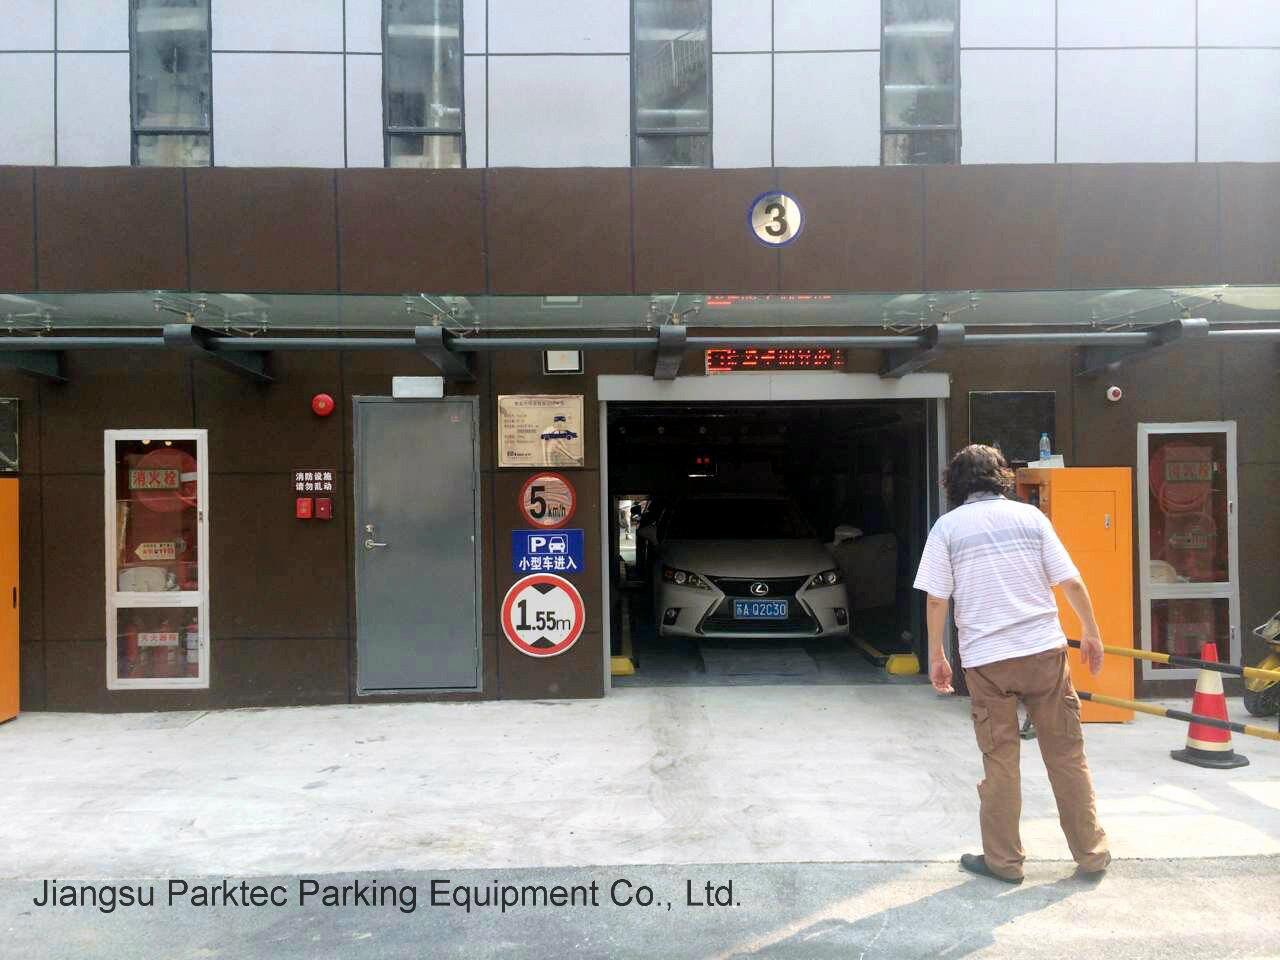 Tower Type Robotic Parking Equipment